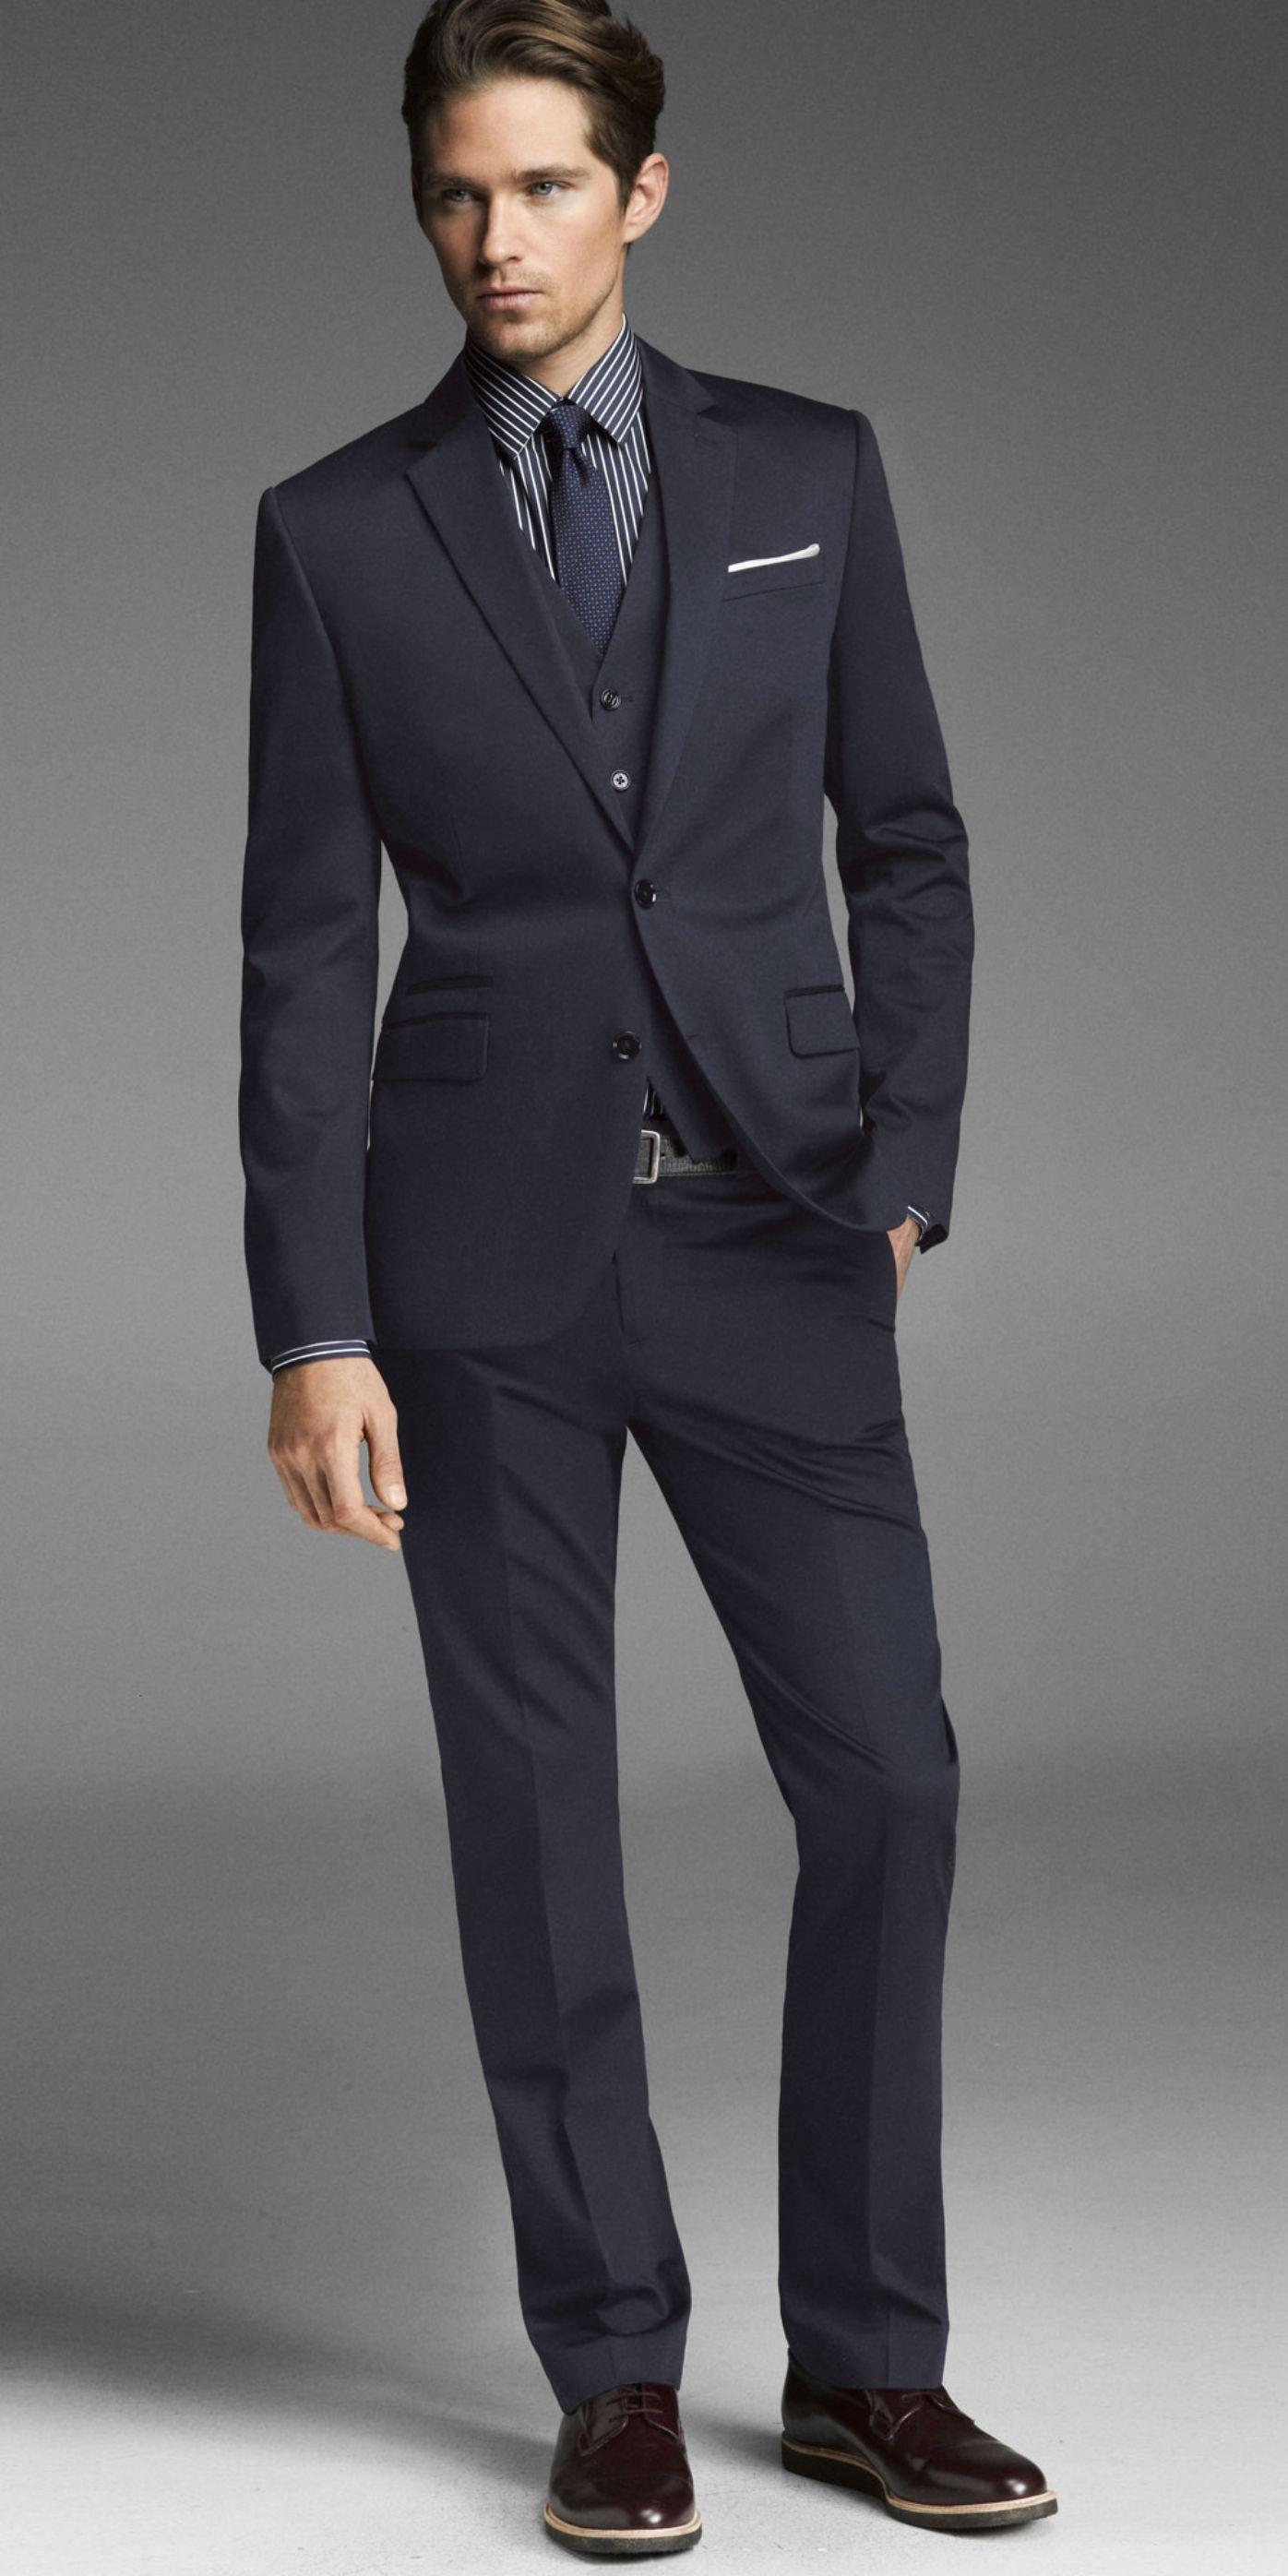 groom suit | Wedding Party Looks | Pinterest | Wedding, Wedding ...